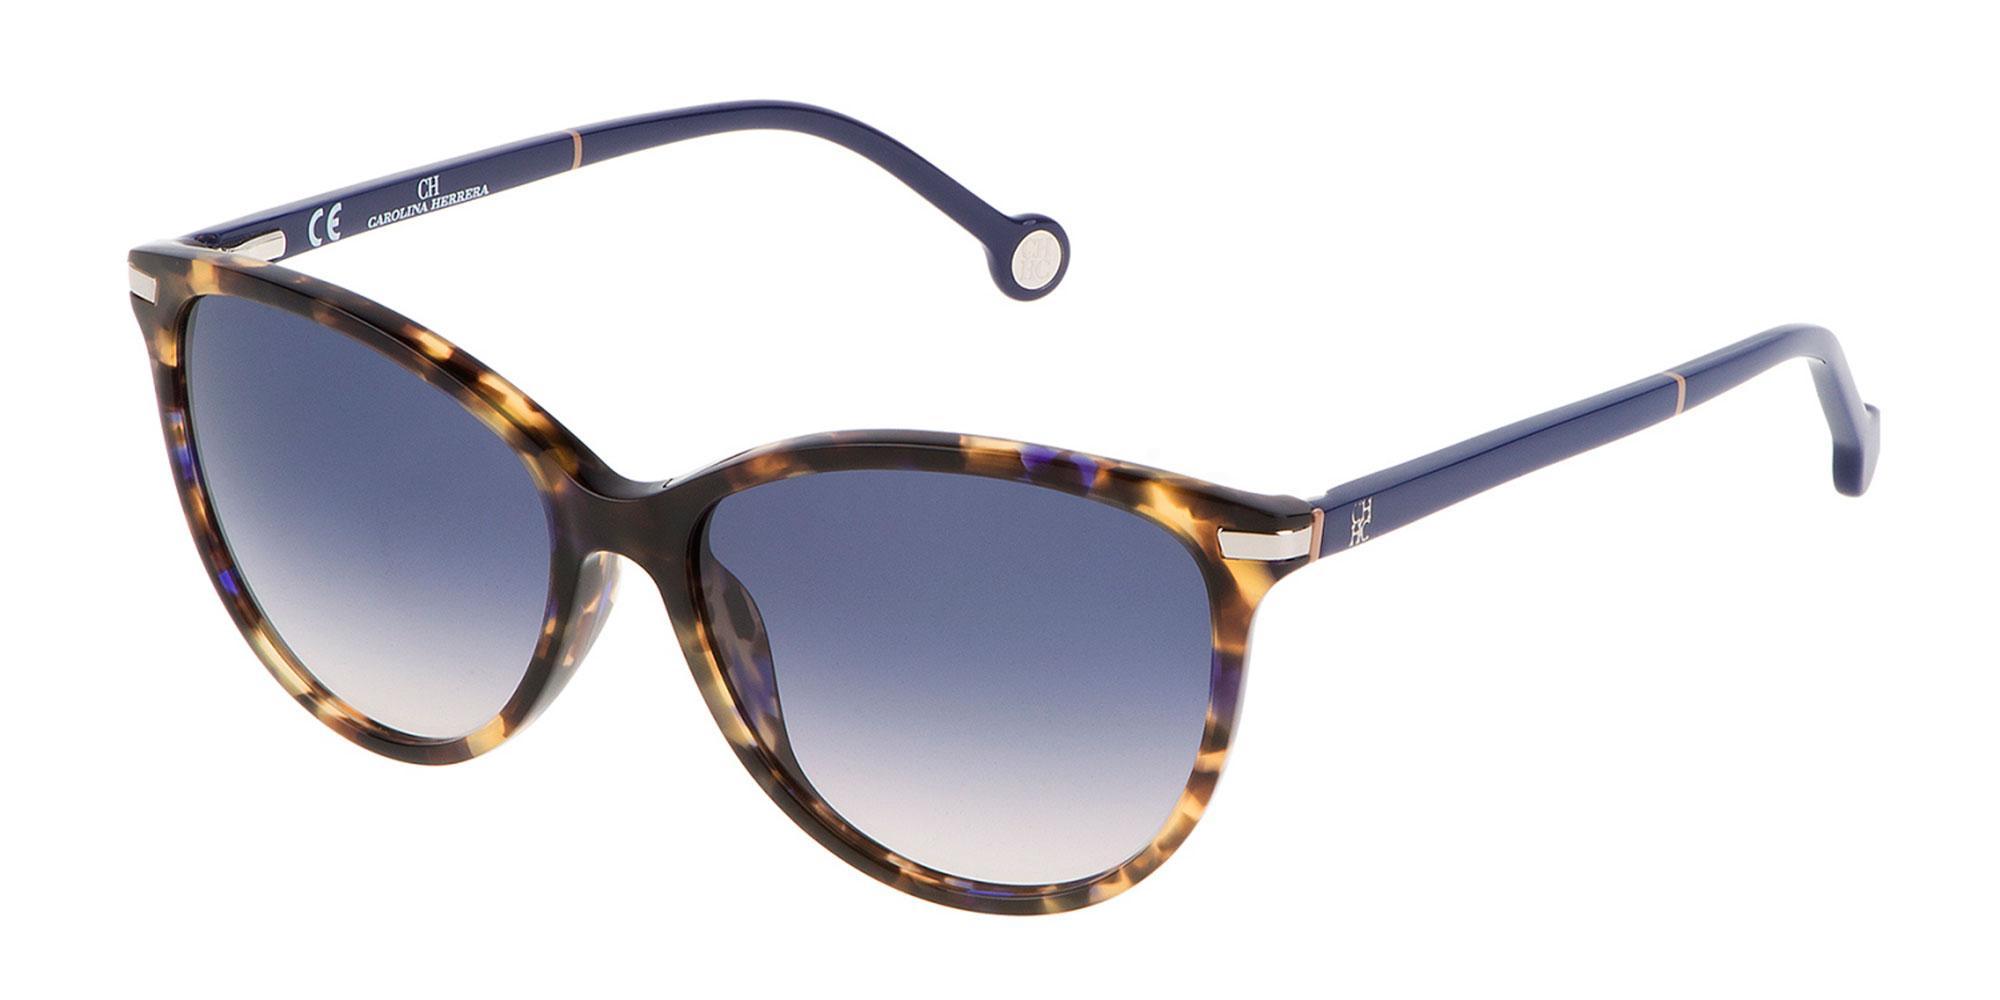 0744 SHE651V Sunglasses, CH Carolina Herrera